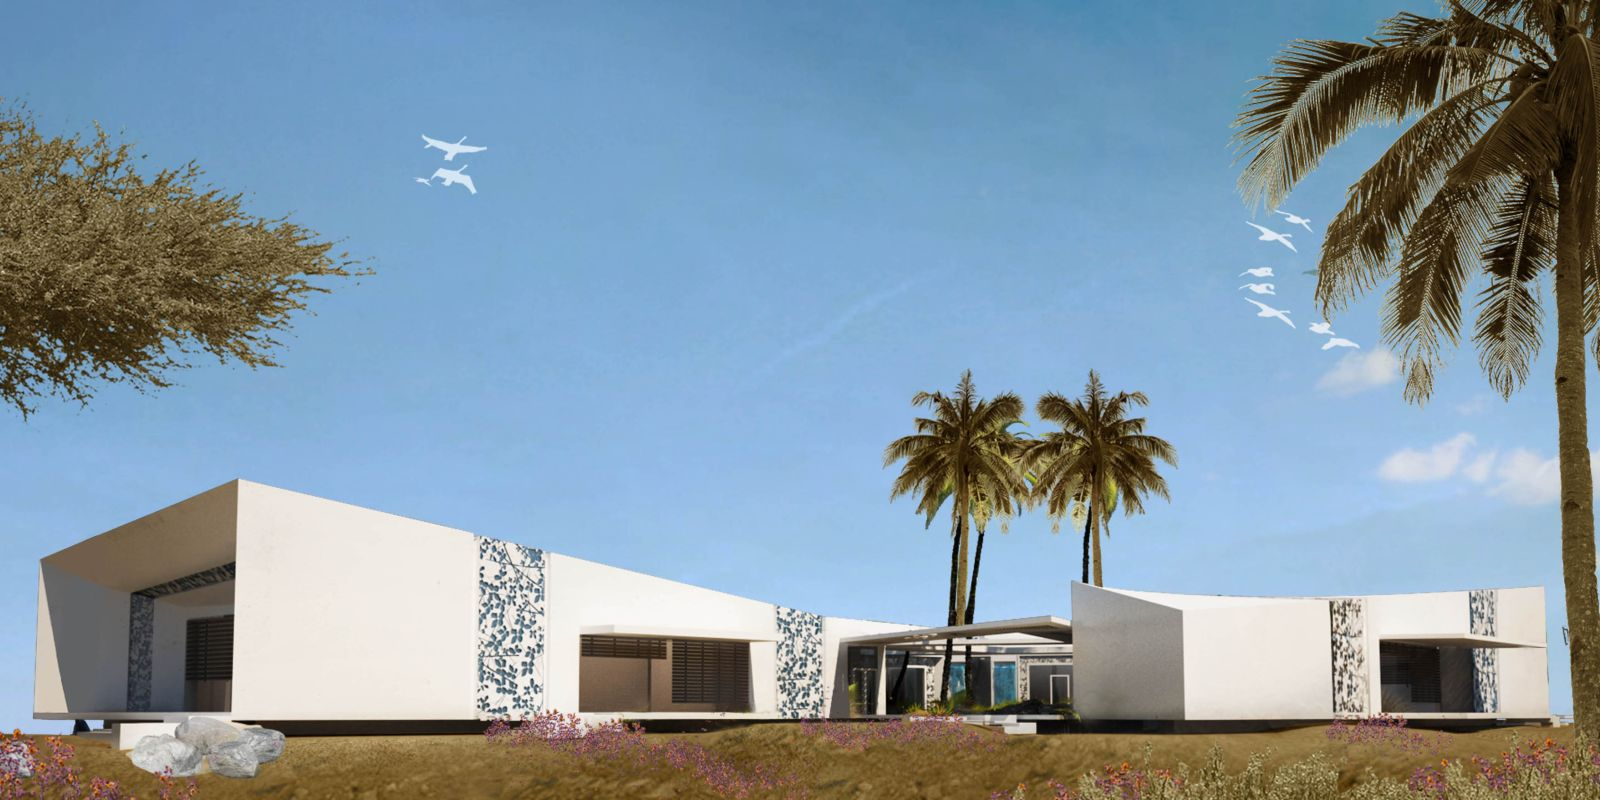 01-Alkhozama-Desert-Casa-de-Ark-Kassam-Arquitectos